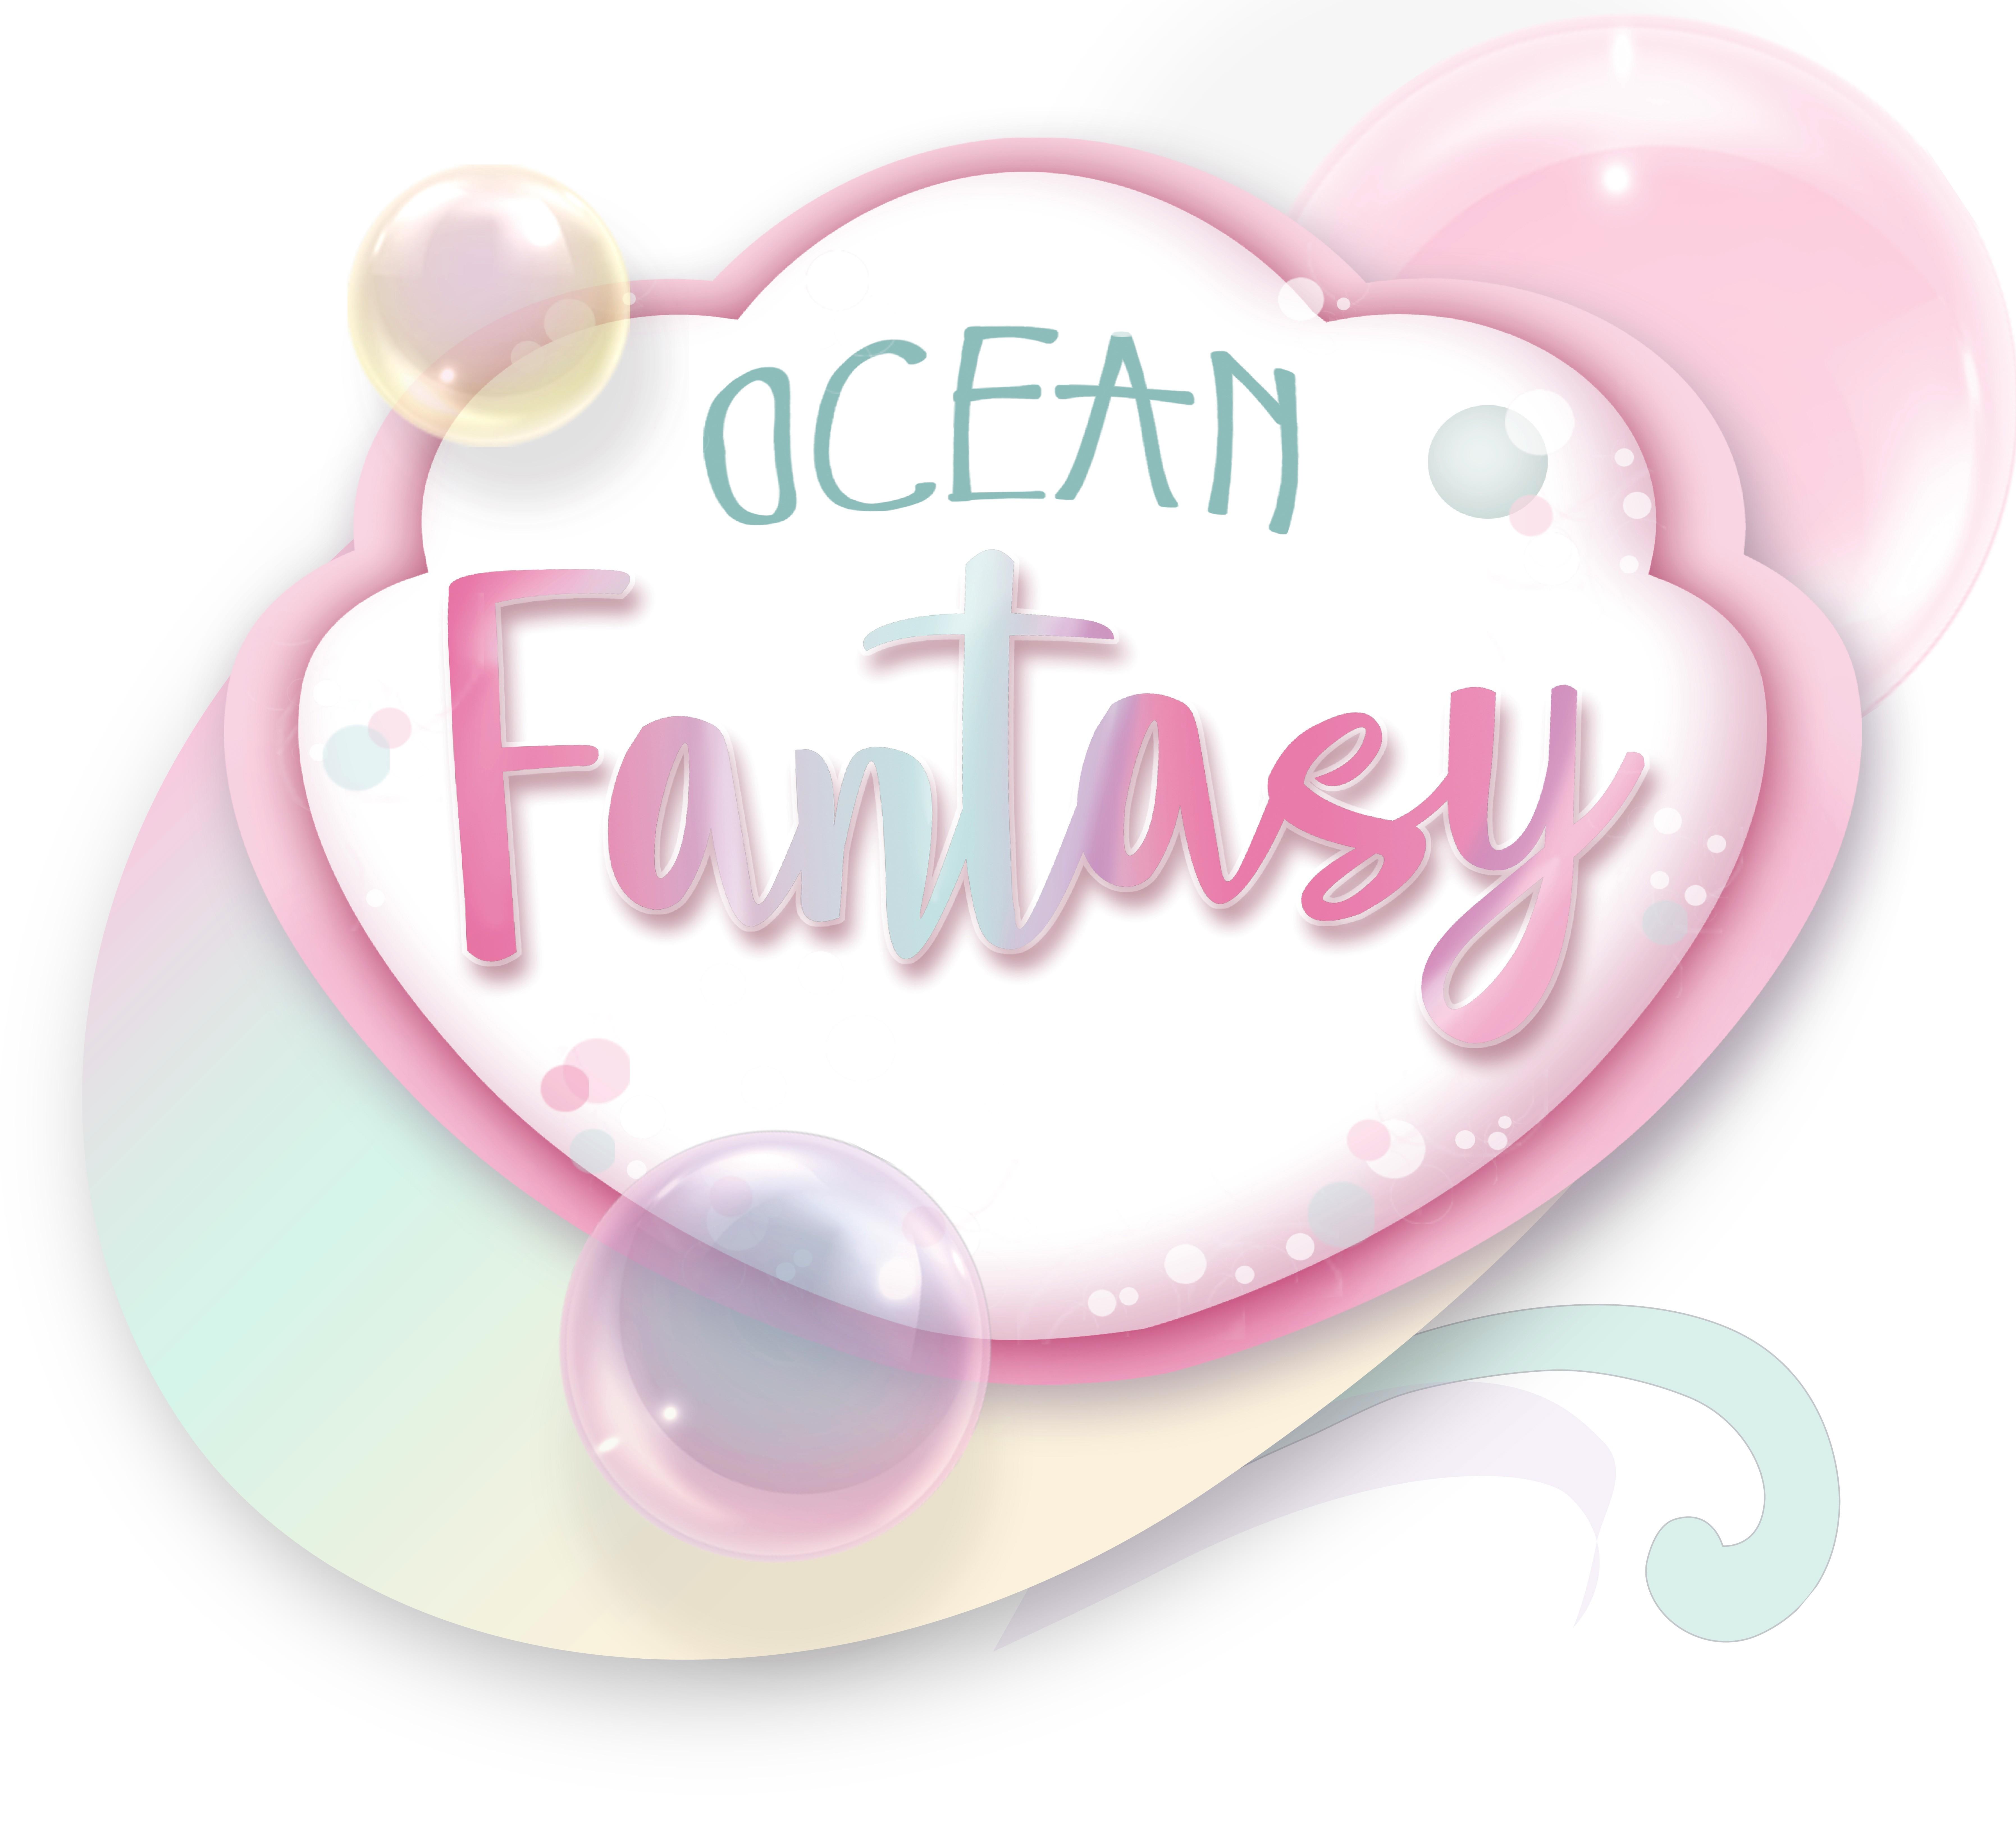 Ocean Fantasy